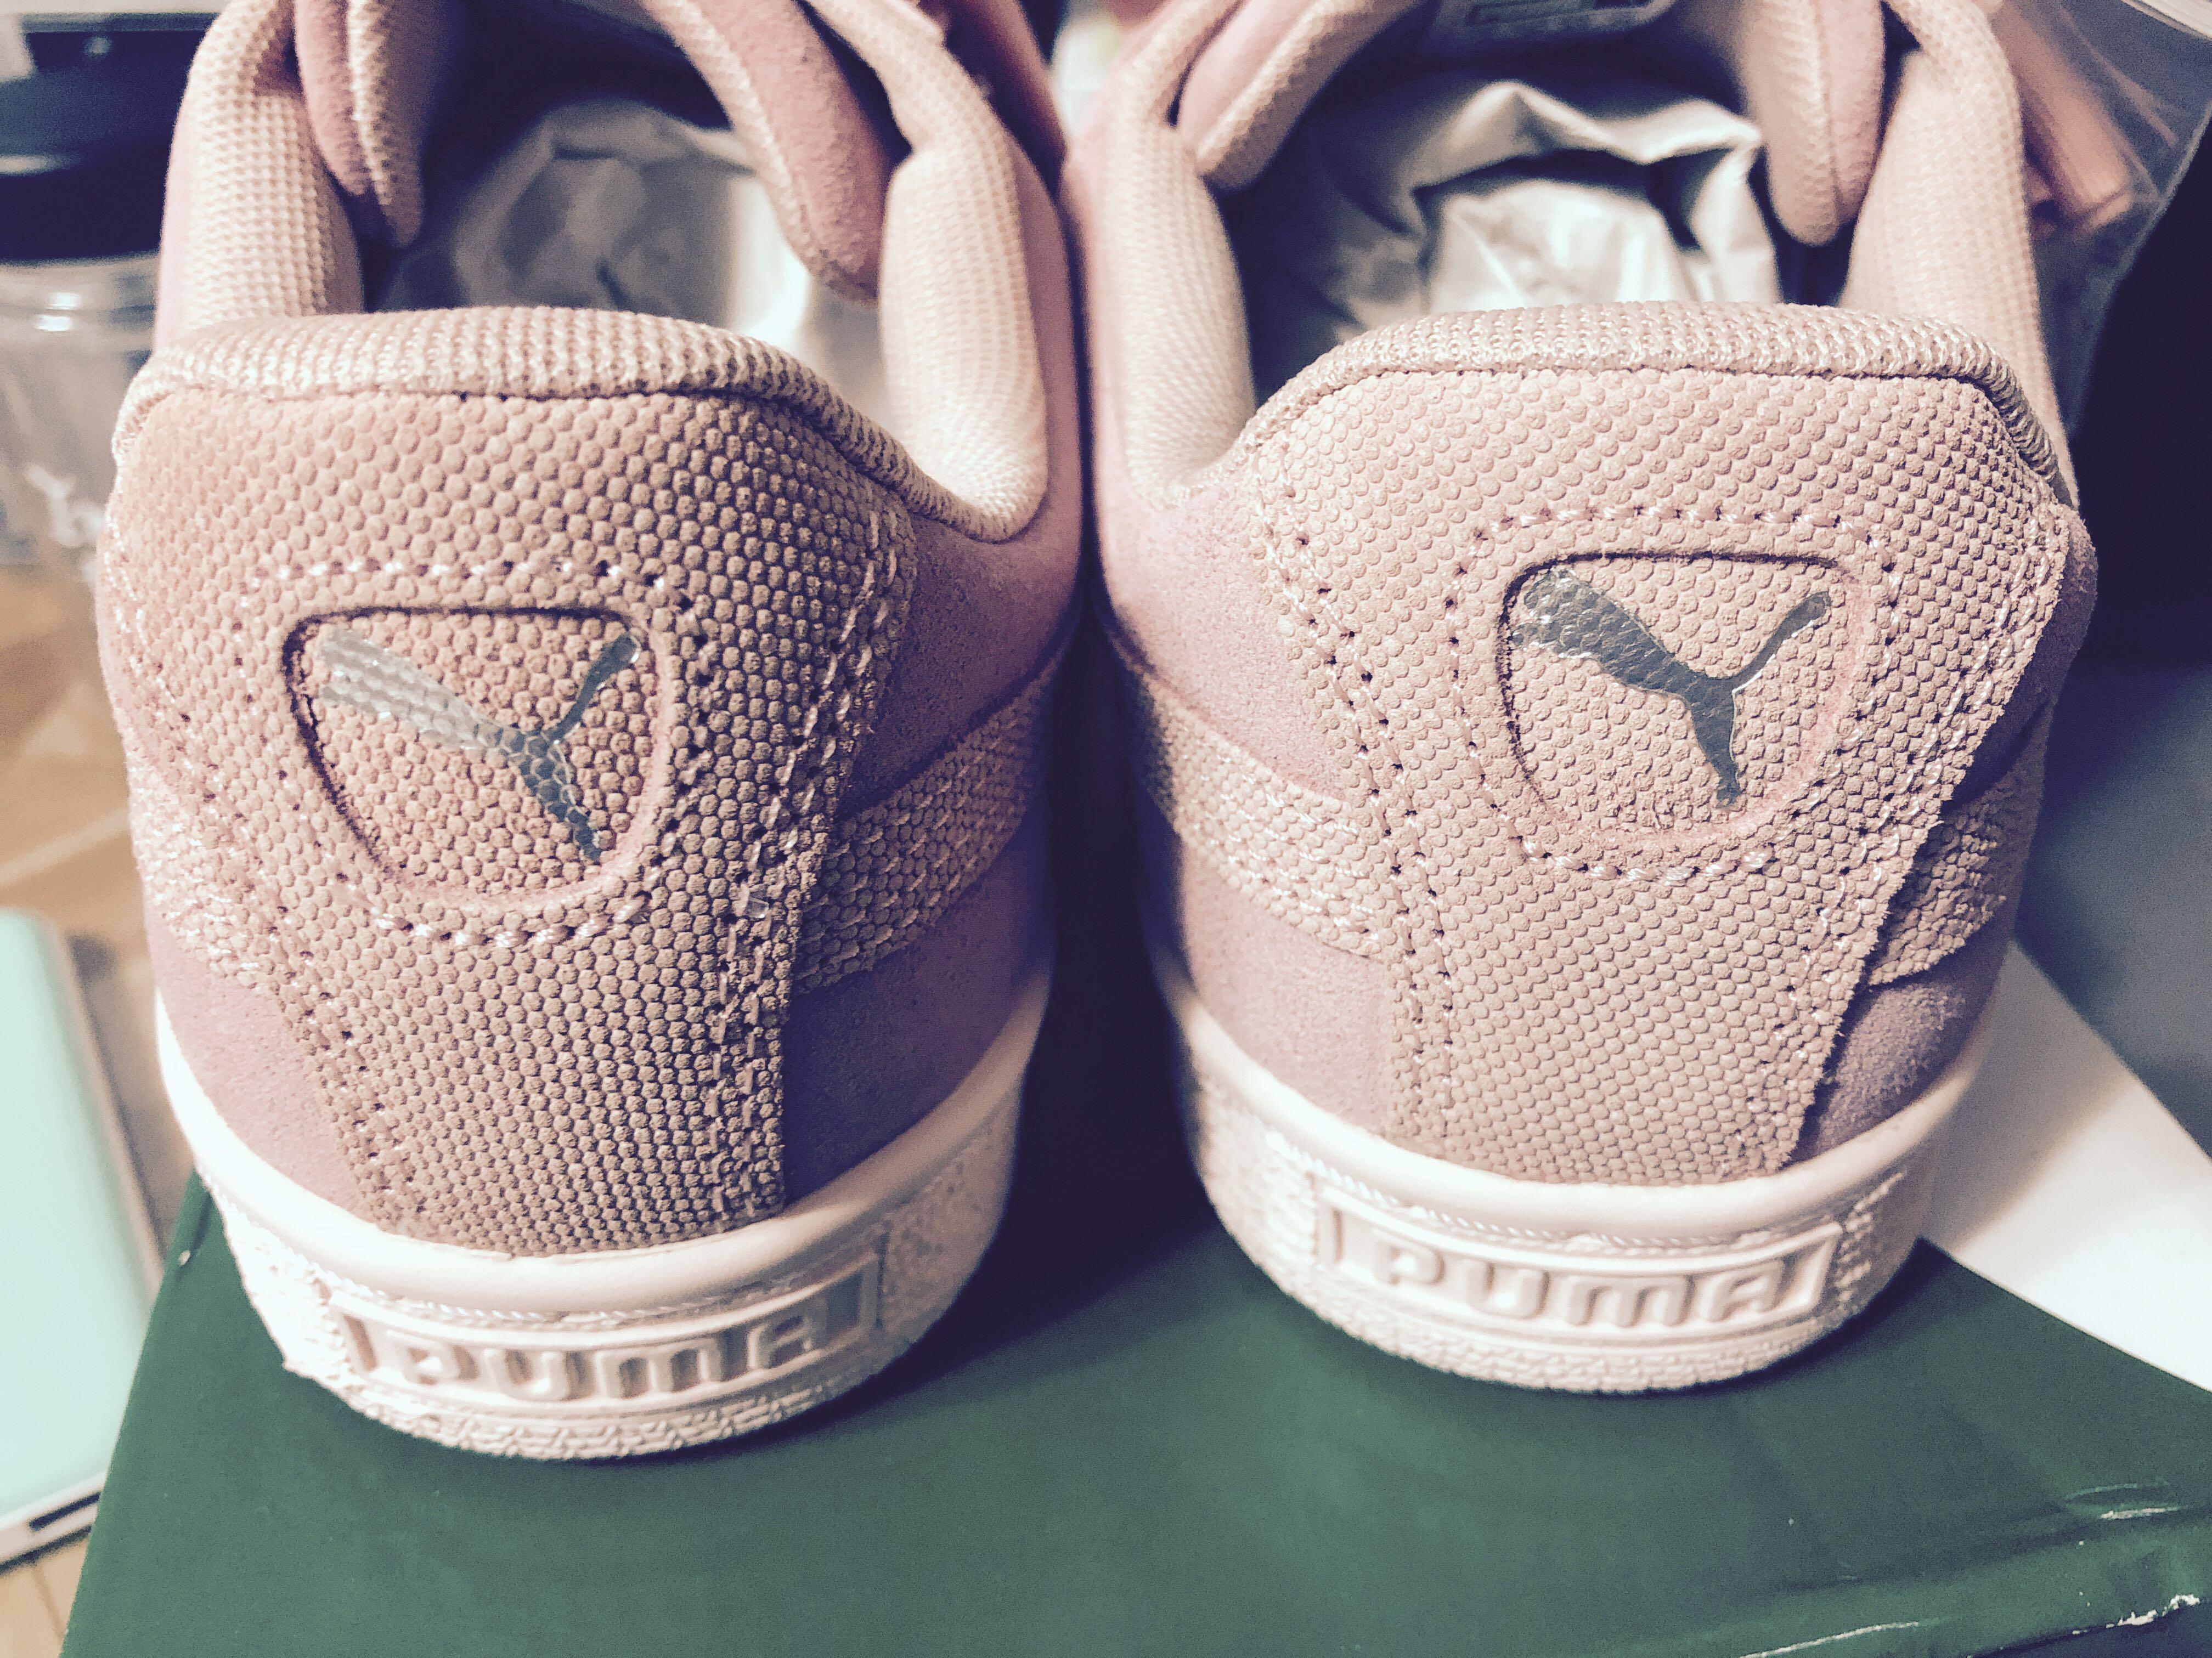 afacfdc7 Puma Suede Heart Pebble Basket, Women's Fashion, Shoes, Sneakers on ...